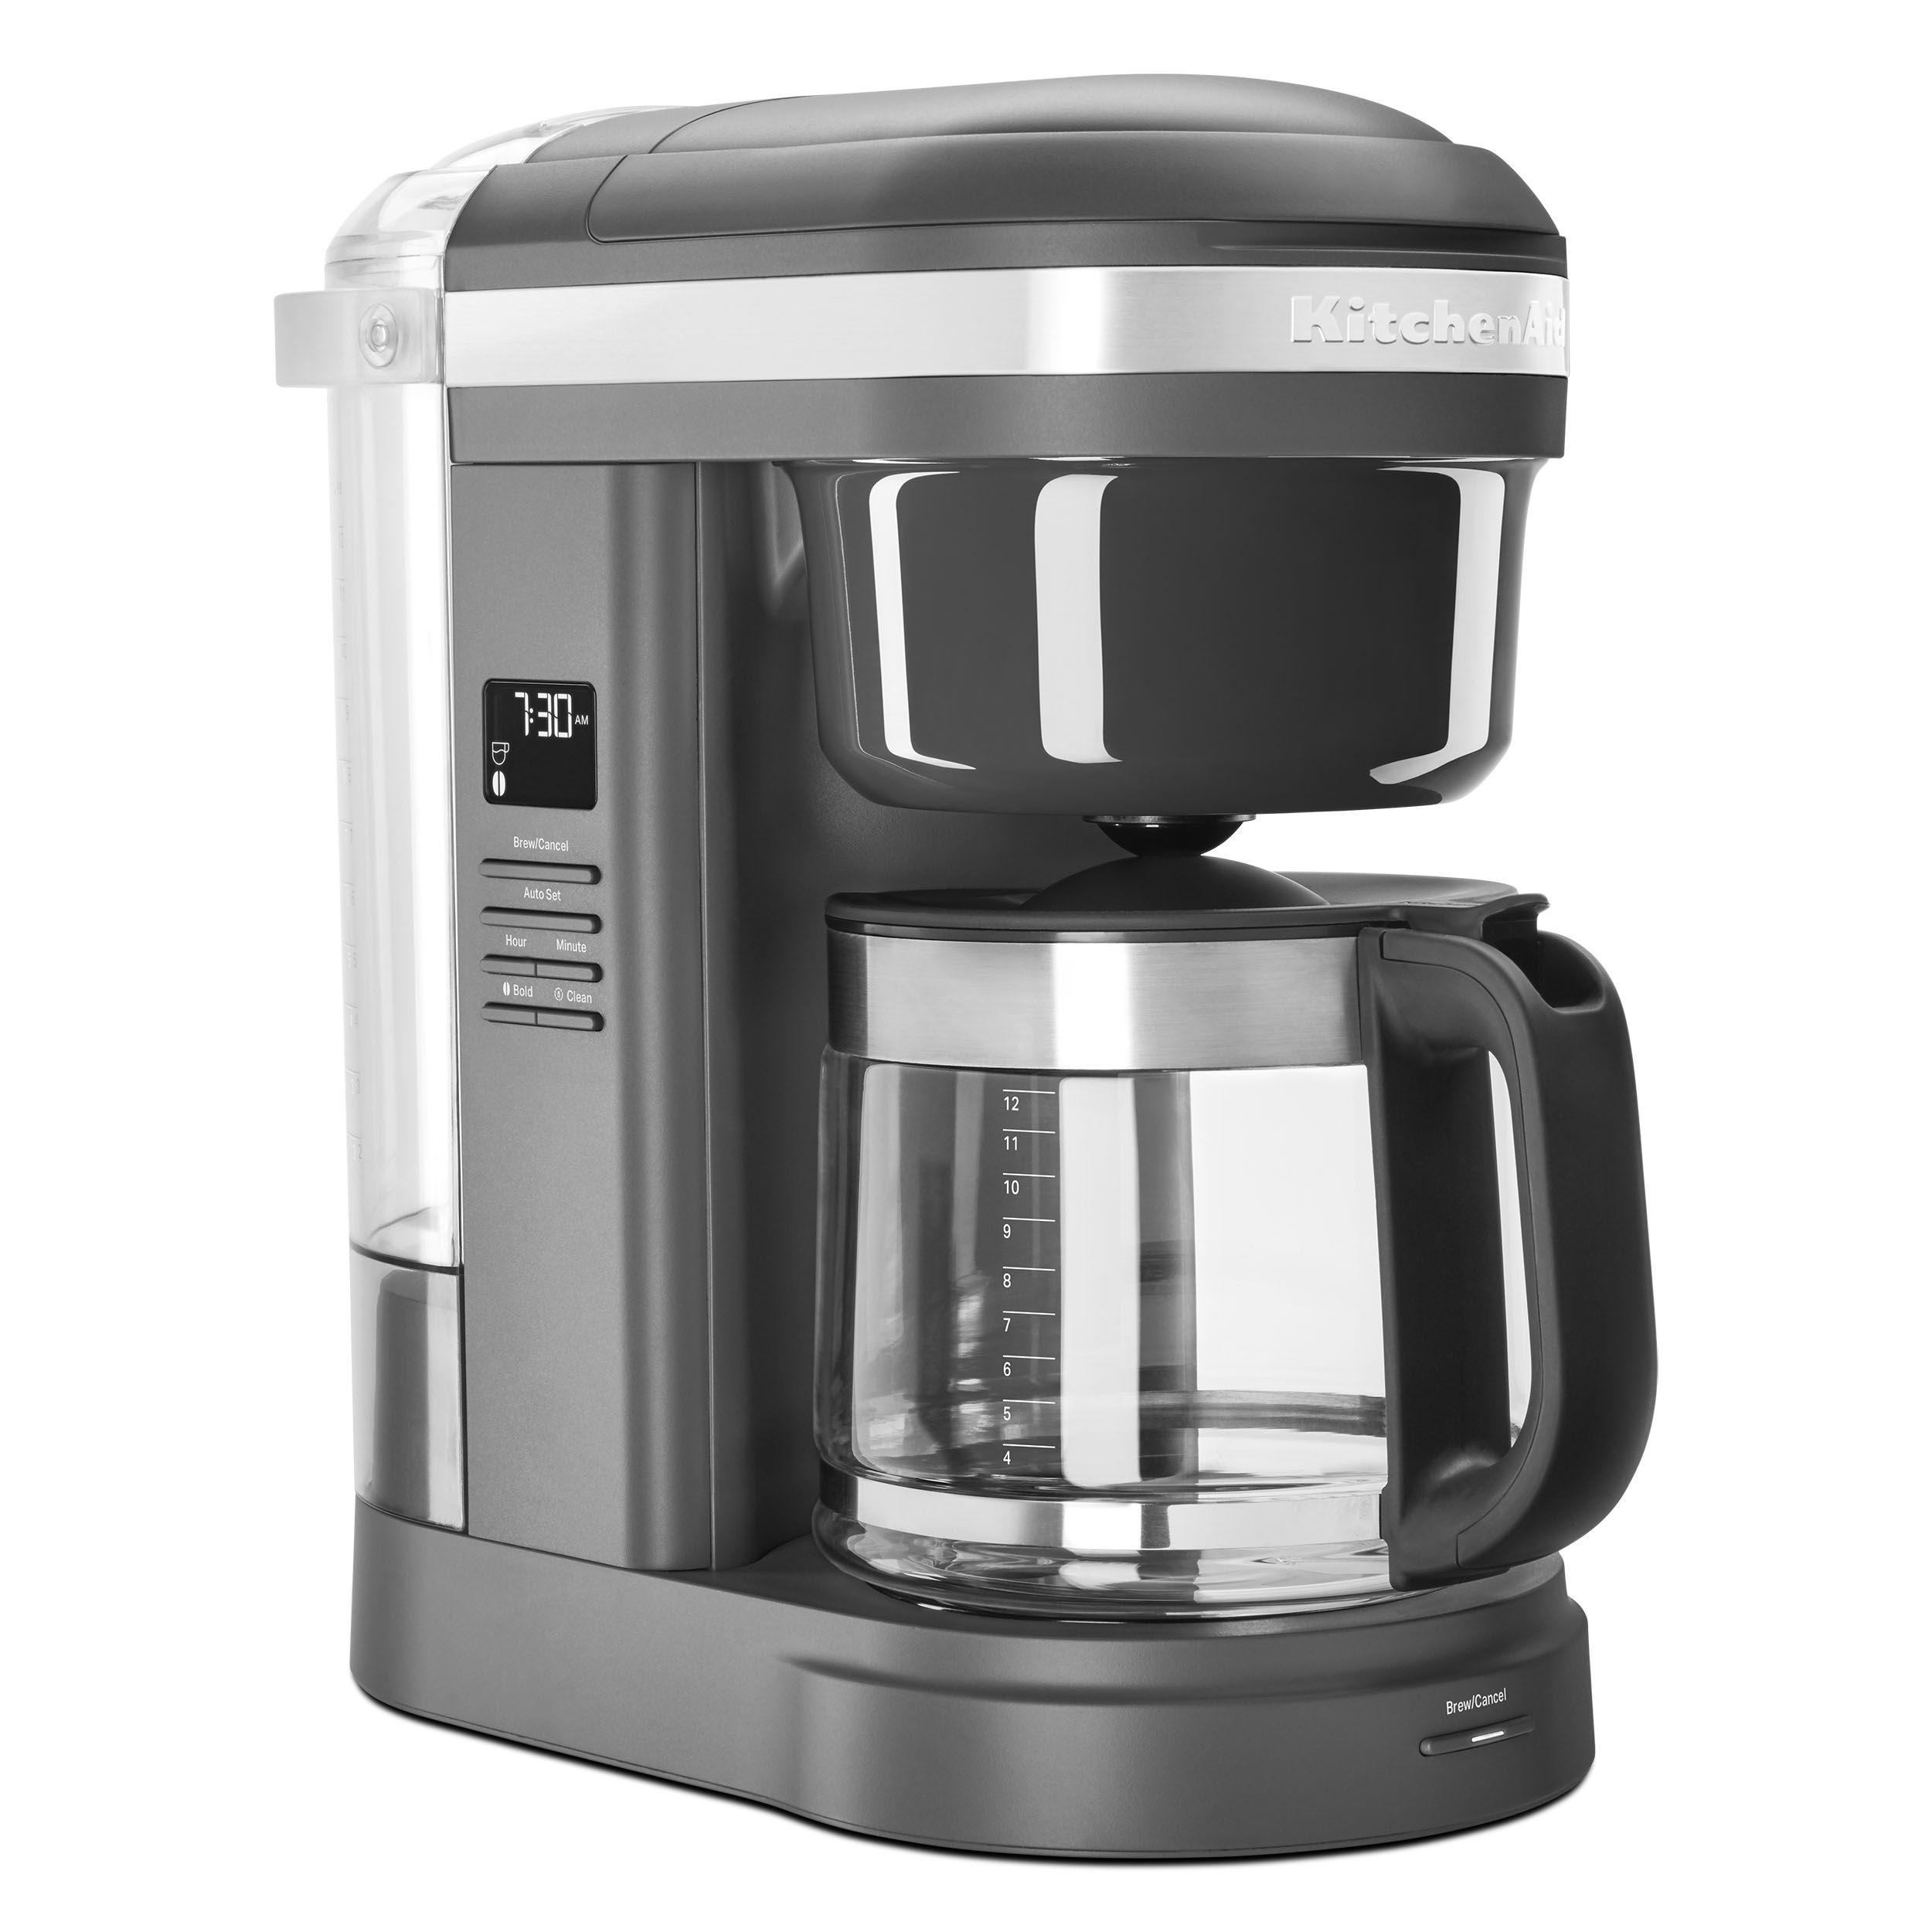 Kitchenaid 12 cup drip coffee maker with spiral showerhead